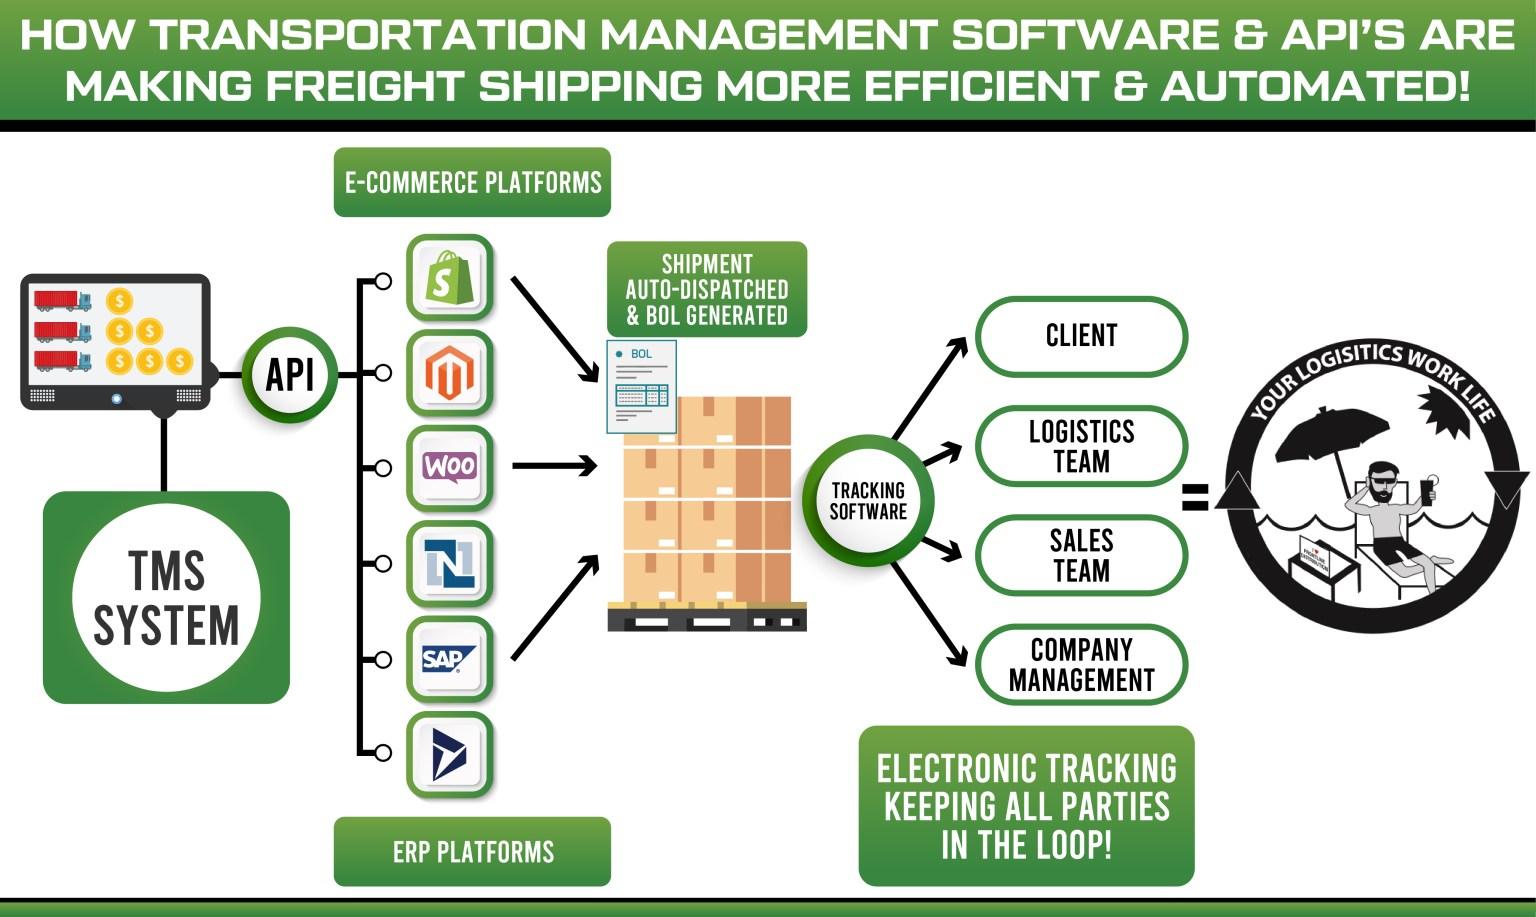 Freight API's and Logistics API automation